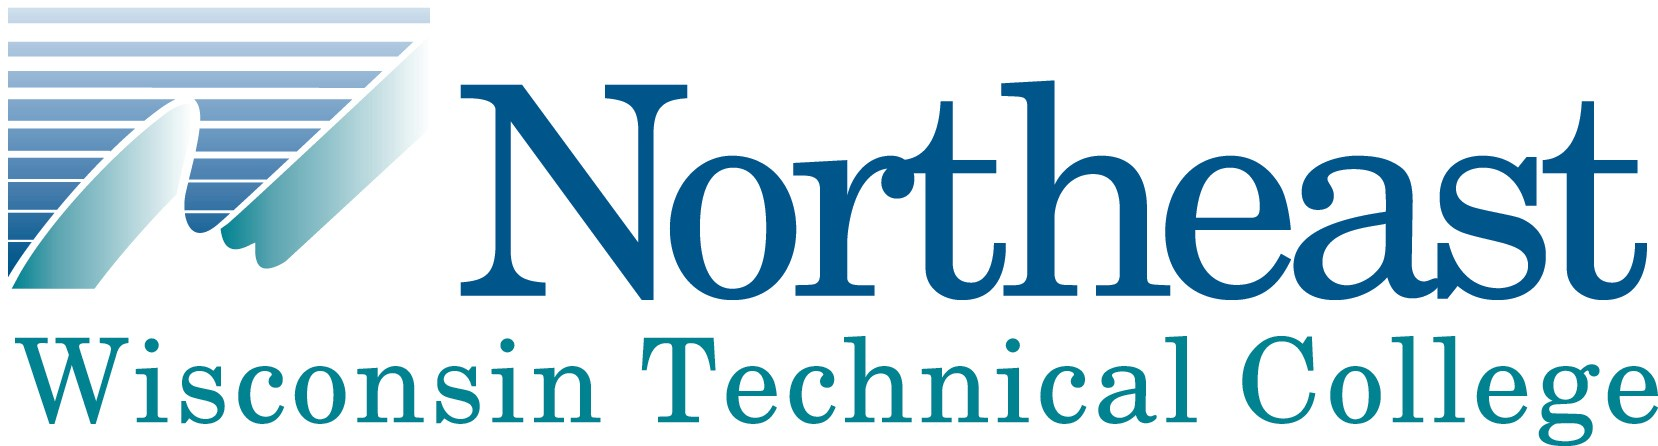 NWTC-logo2018.jpg